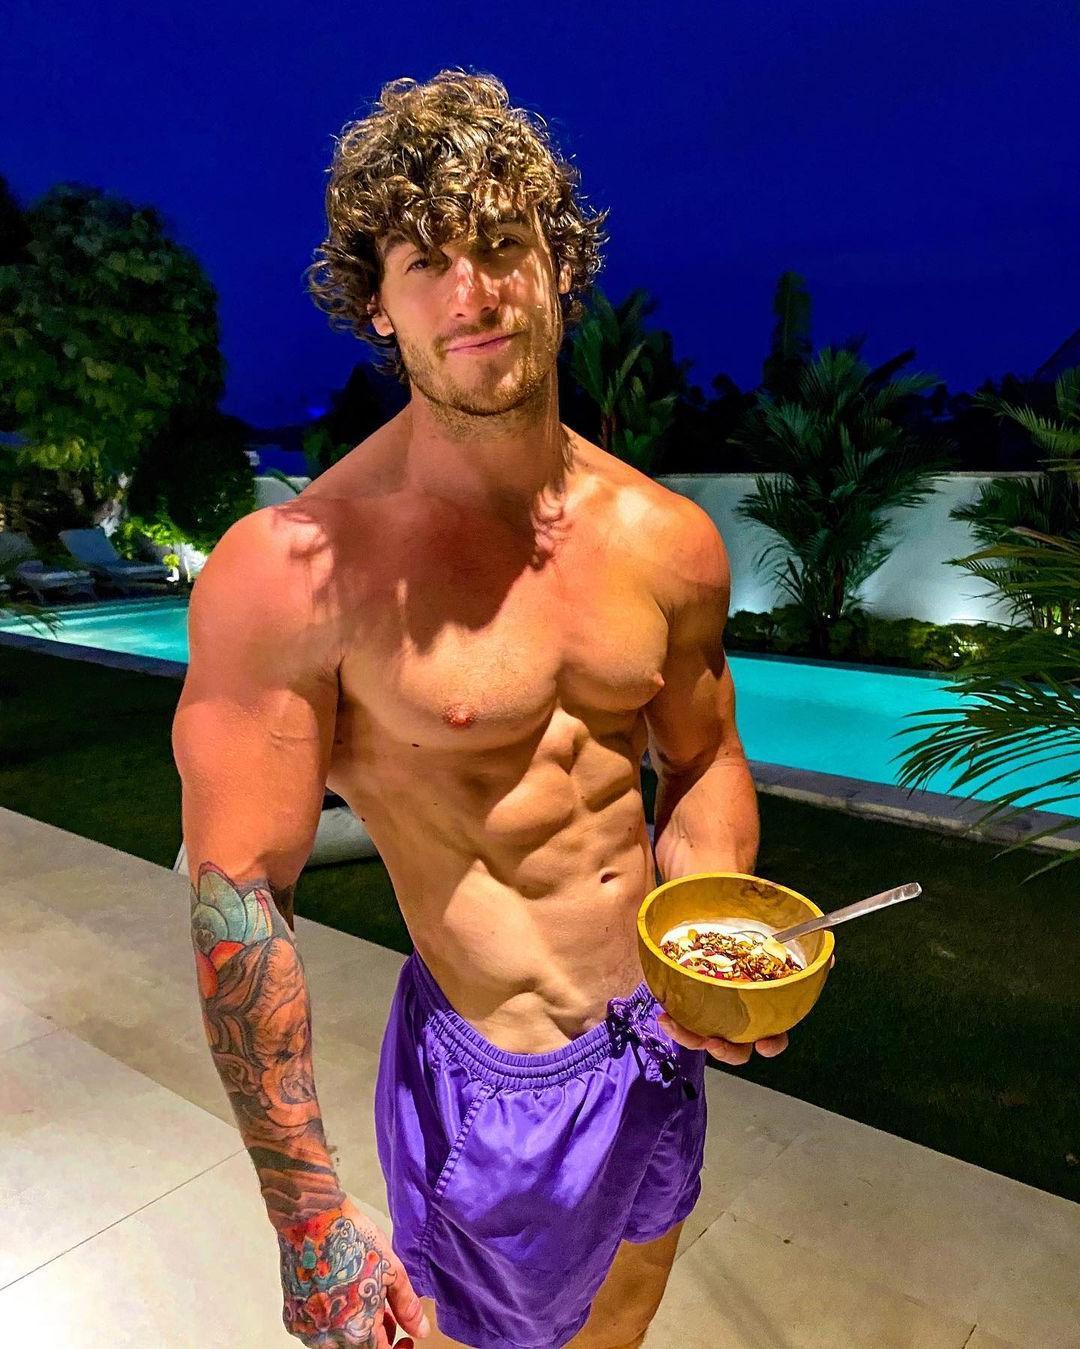 cute-curly-guys-owen-harrison-shirtless-muscular-body-perky-pecs-pointy-nips-eating-muesli